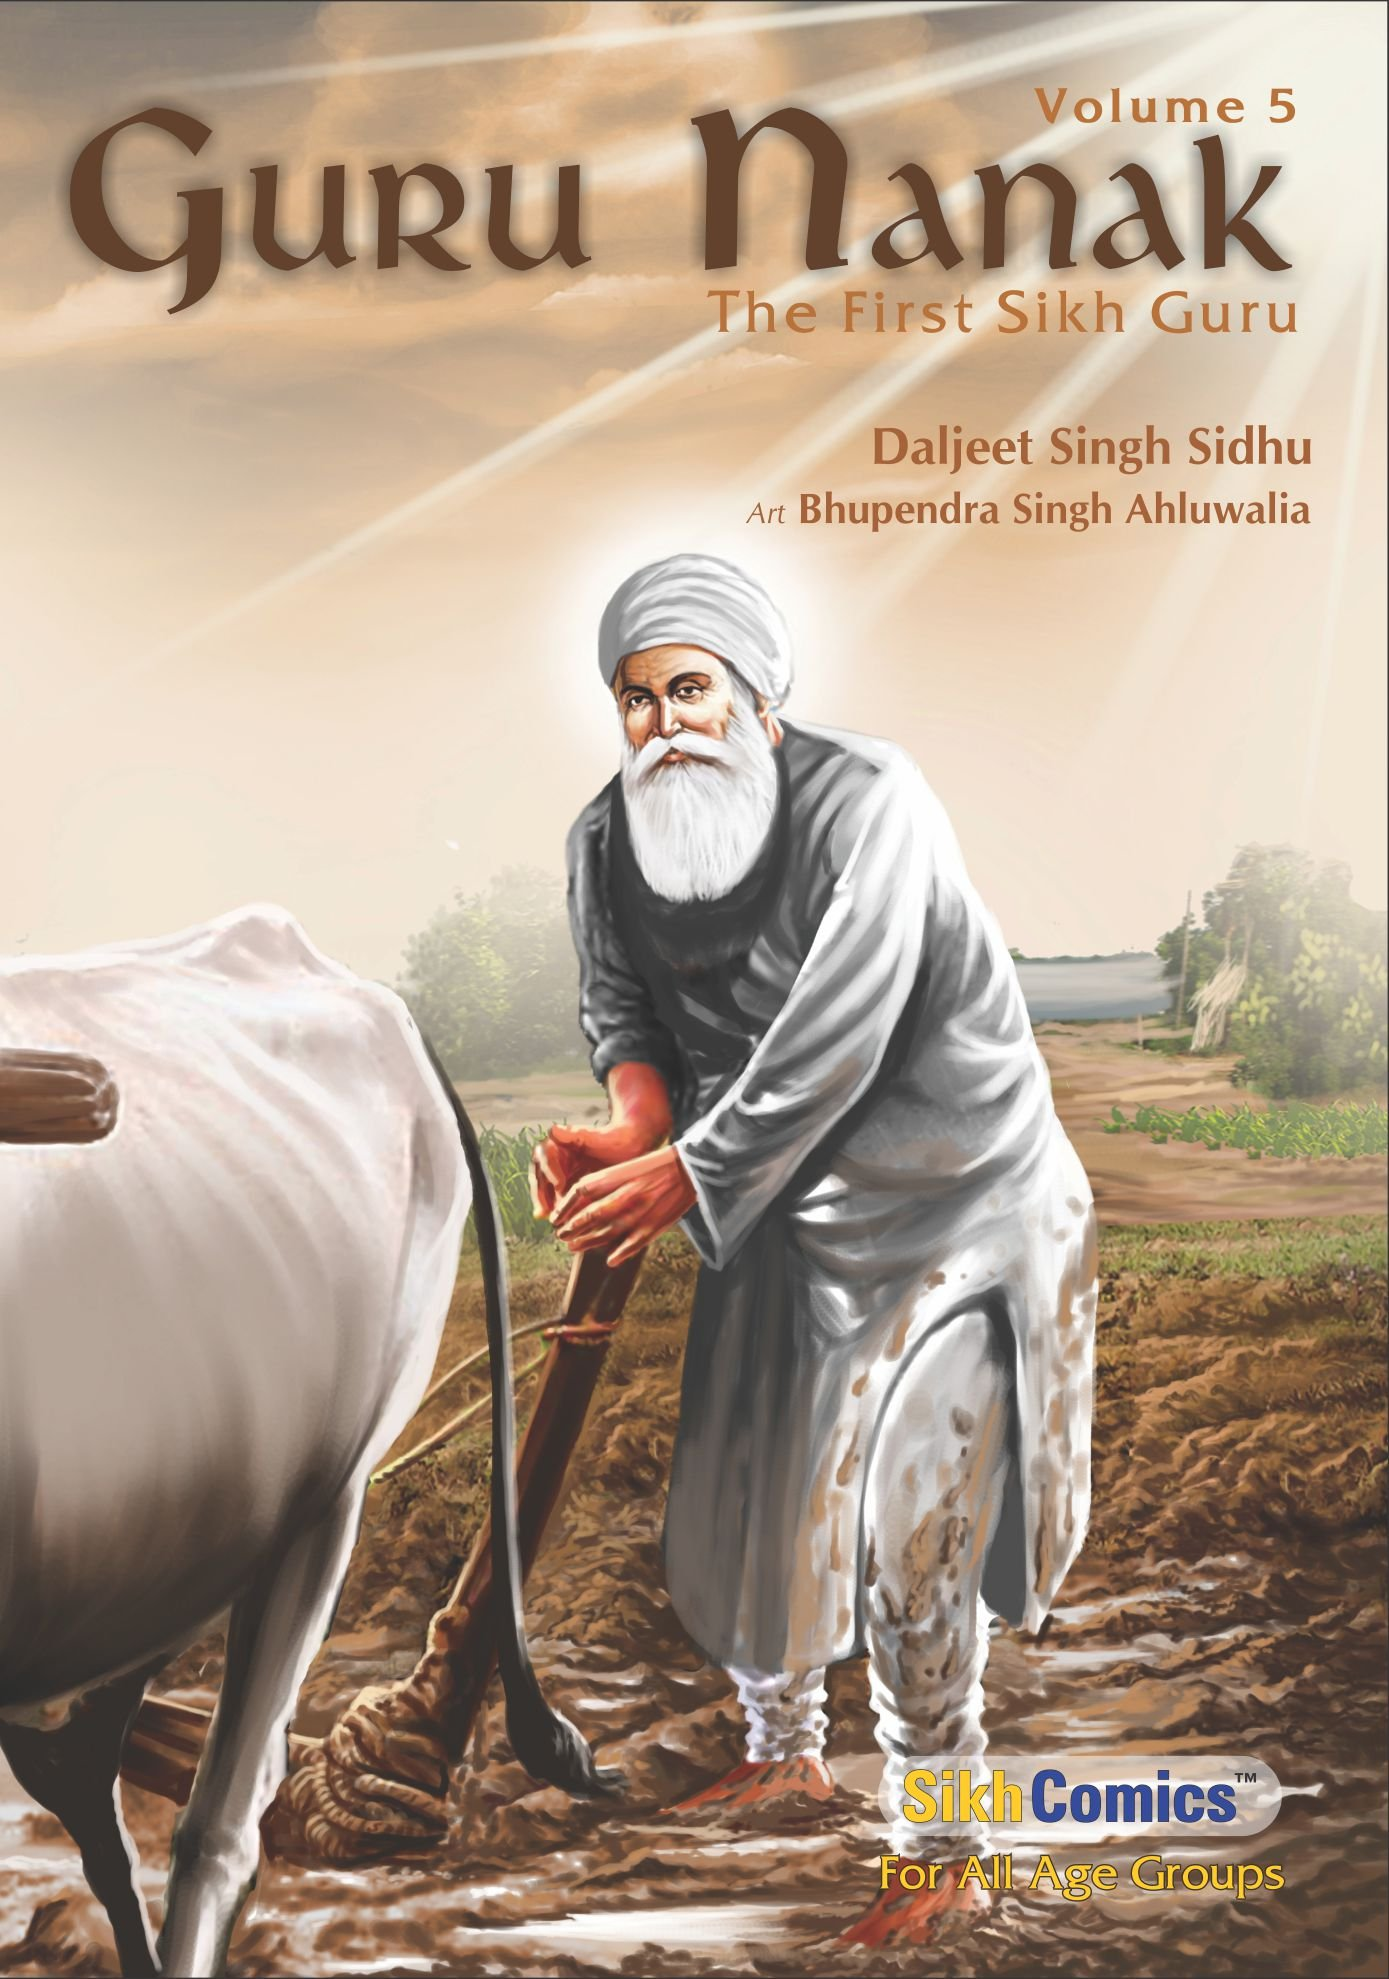 Guru Nanak - The First Sikh Guru (Volume 5) ebook